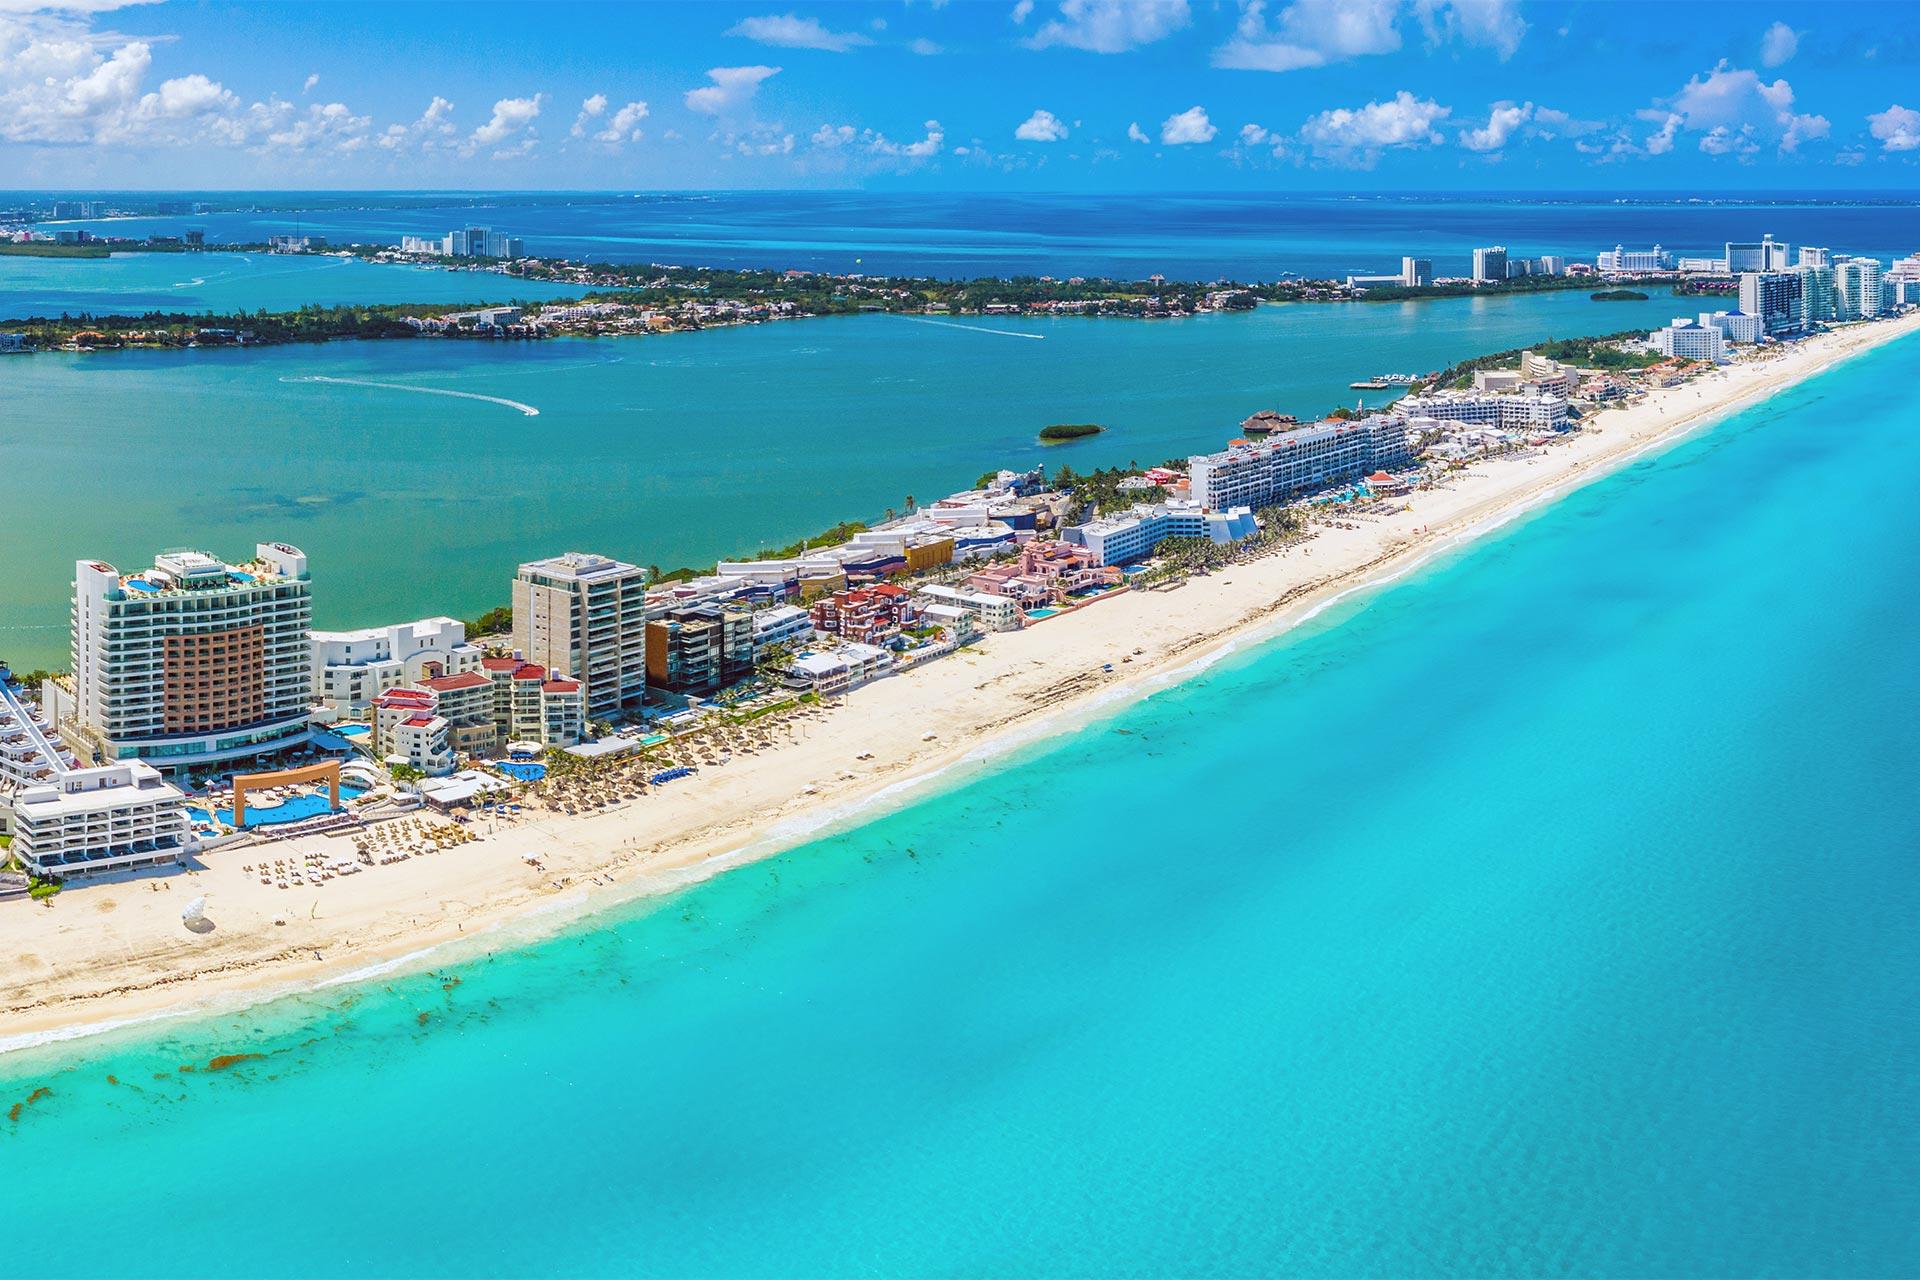 Sejur Cancun si plaja Riviera Maya, Mexic, 11 zile - 26 noiembrie 2021